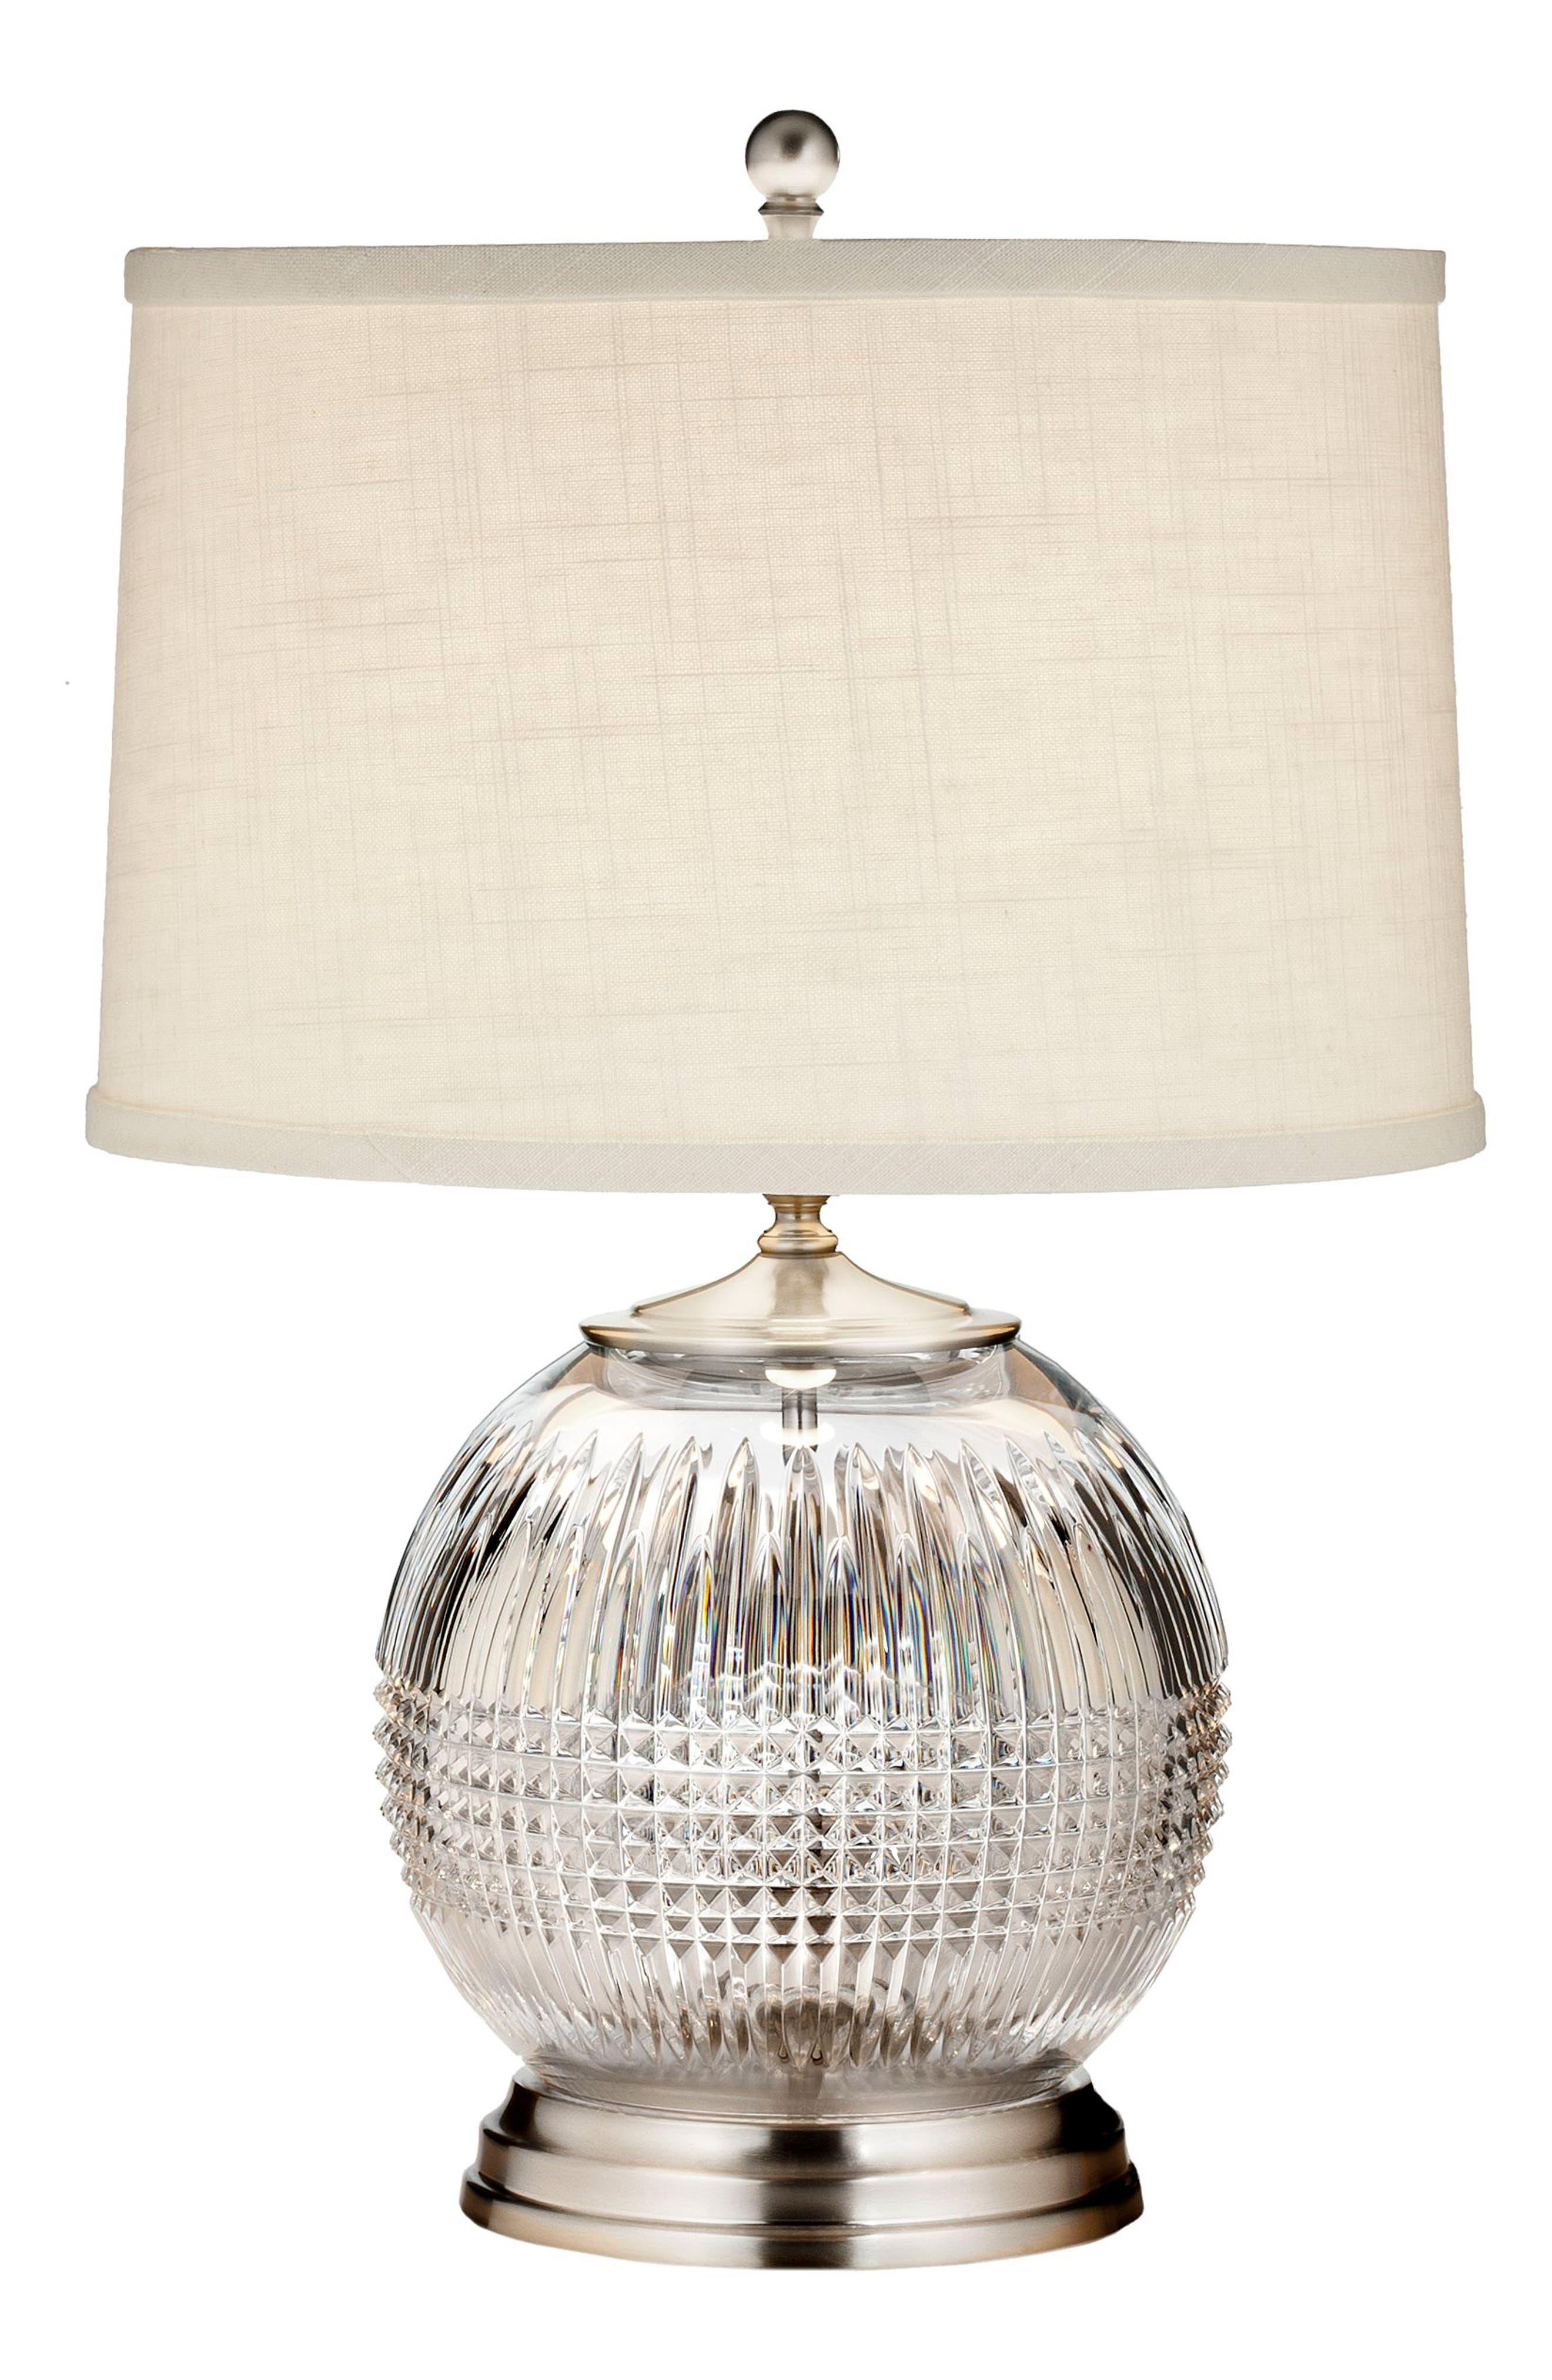 Waterford Lismore Diamond Lead Crystal & Chrome Table Lamp